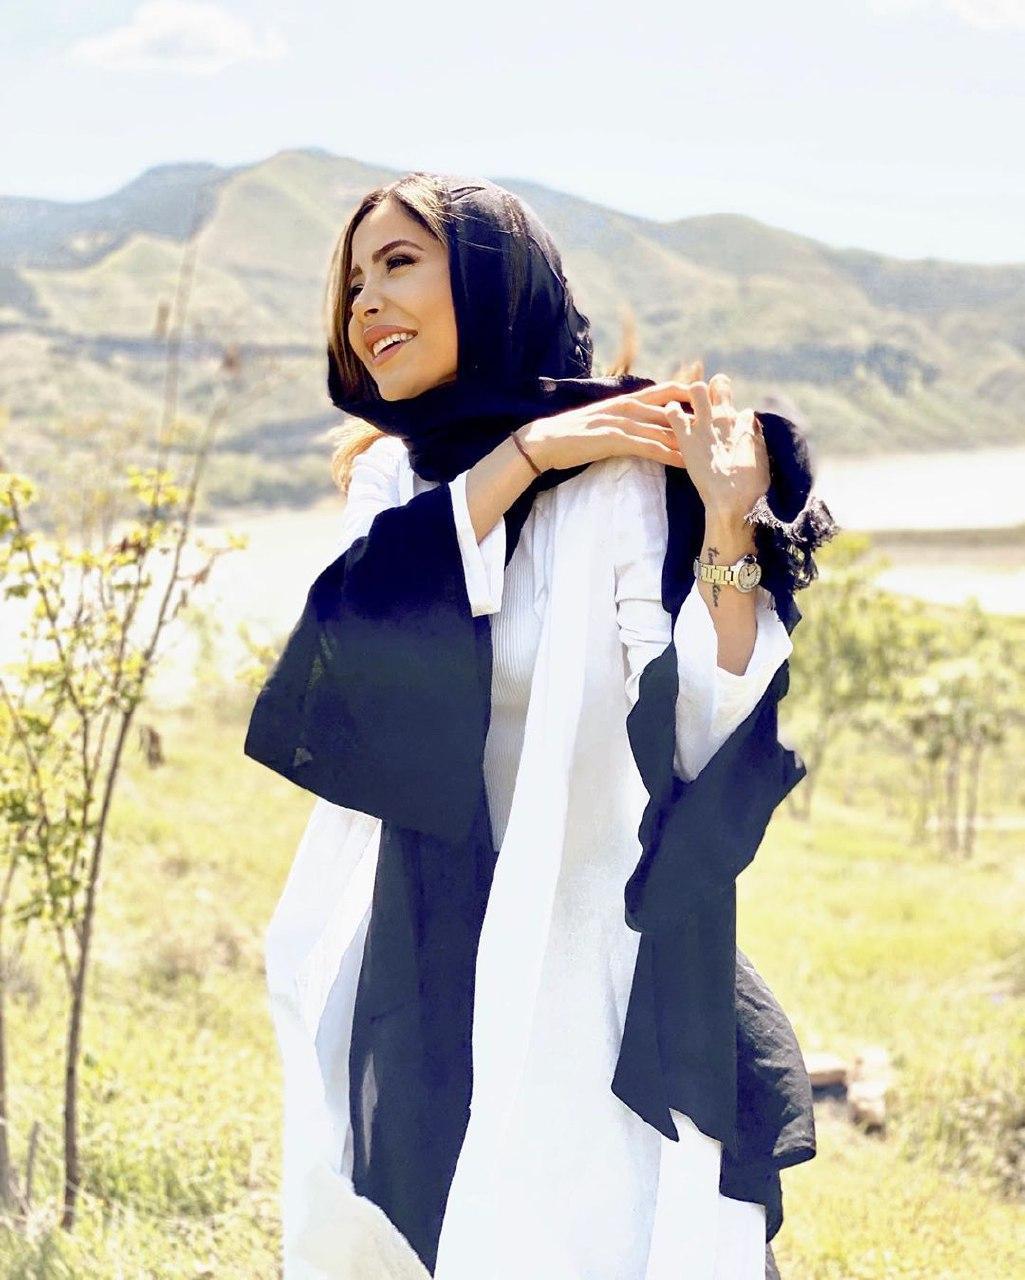 آیتک جاوید نژاد کشف حجاب